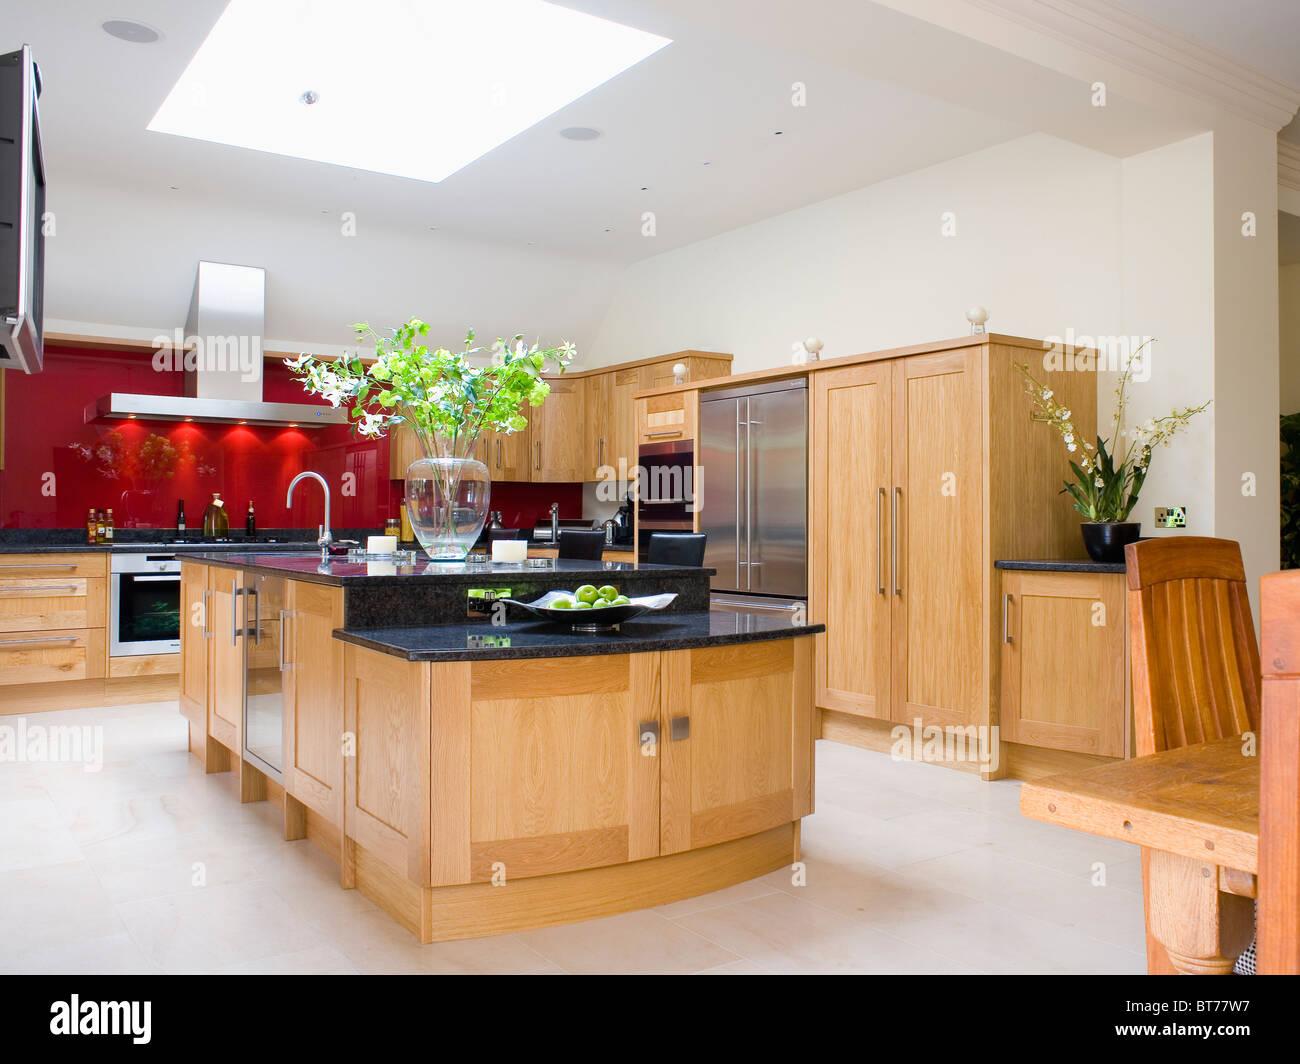 Pale Wood Island Unit With Black Granite Worktop In Large Modern Kitchen Extension Limestone Flooring